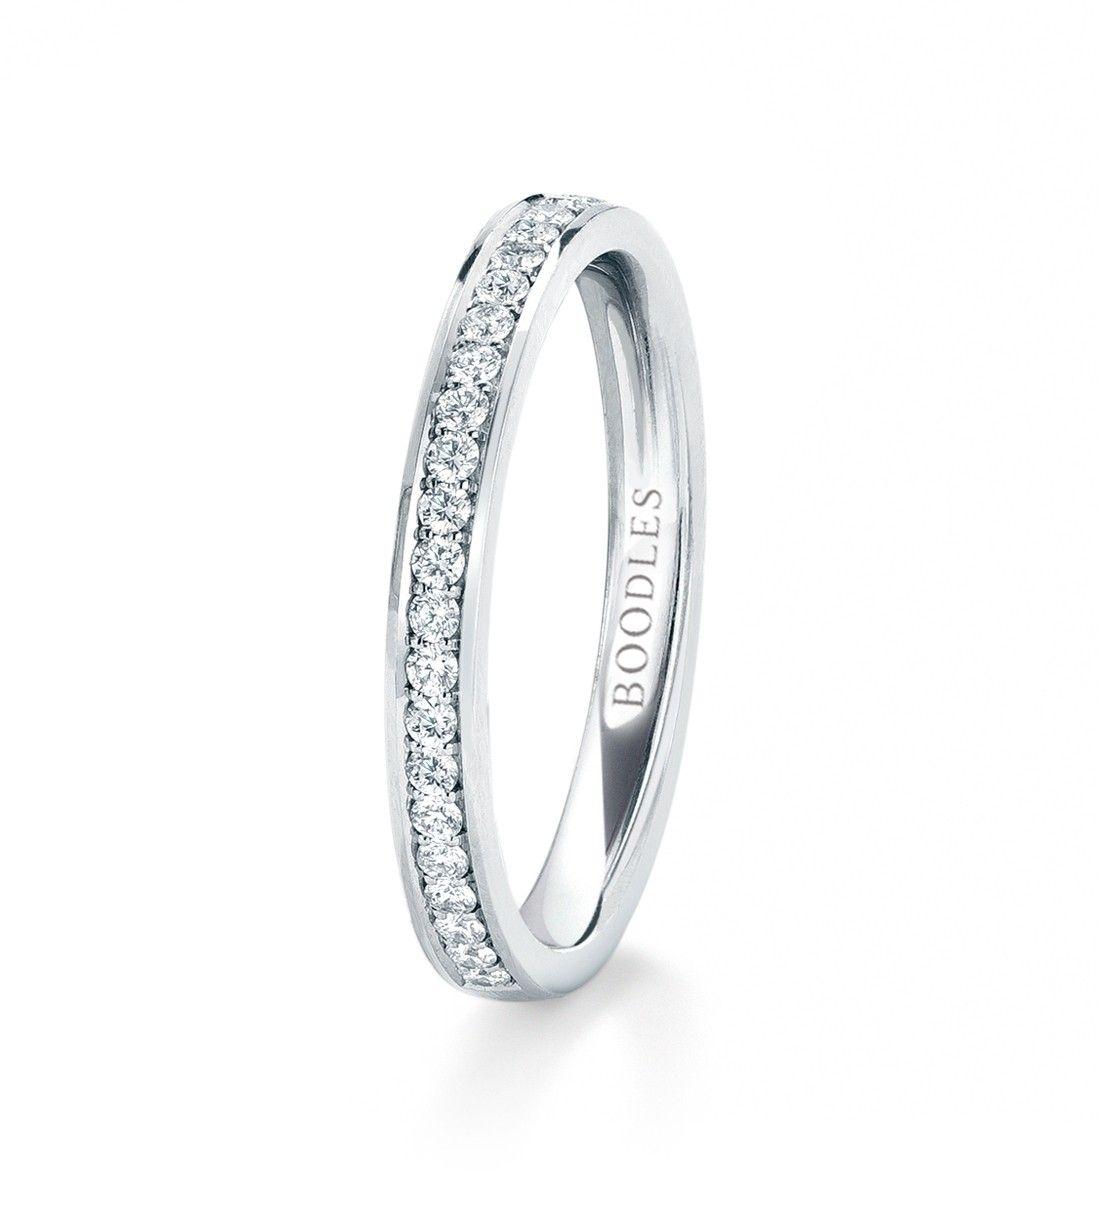 Harmony Half Hoop Diamond Wedding Band . In platinum with diamonds